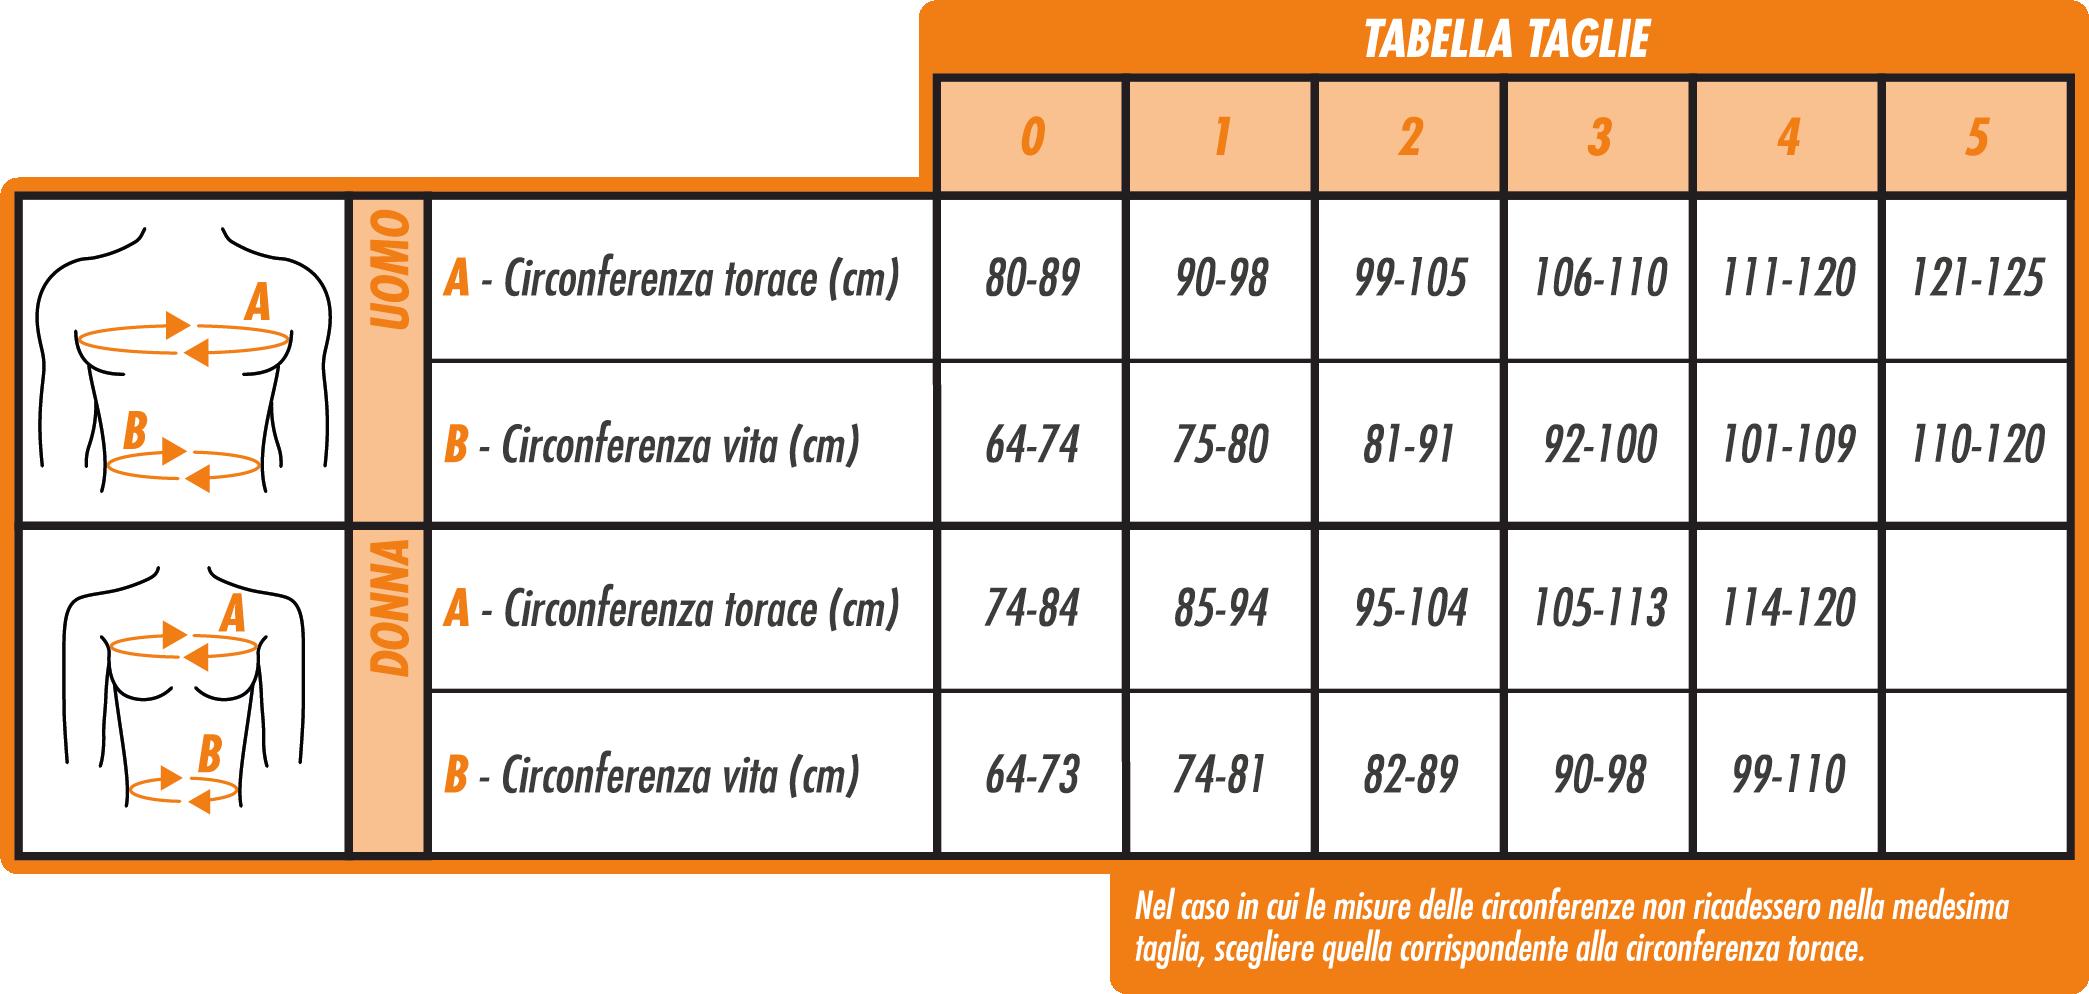 tabella-taglie-S2-ita.png